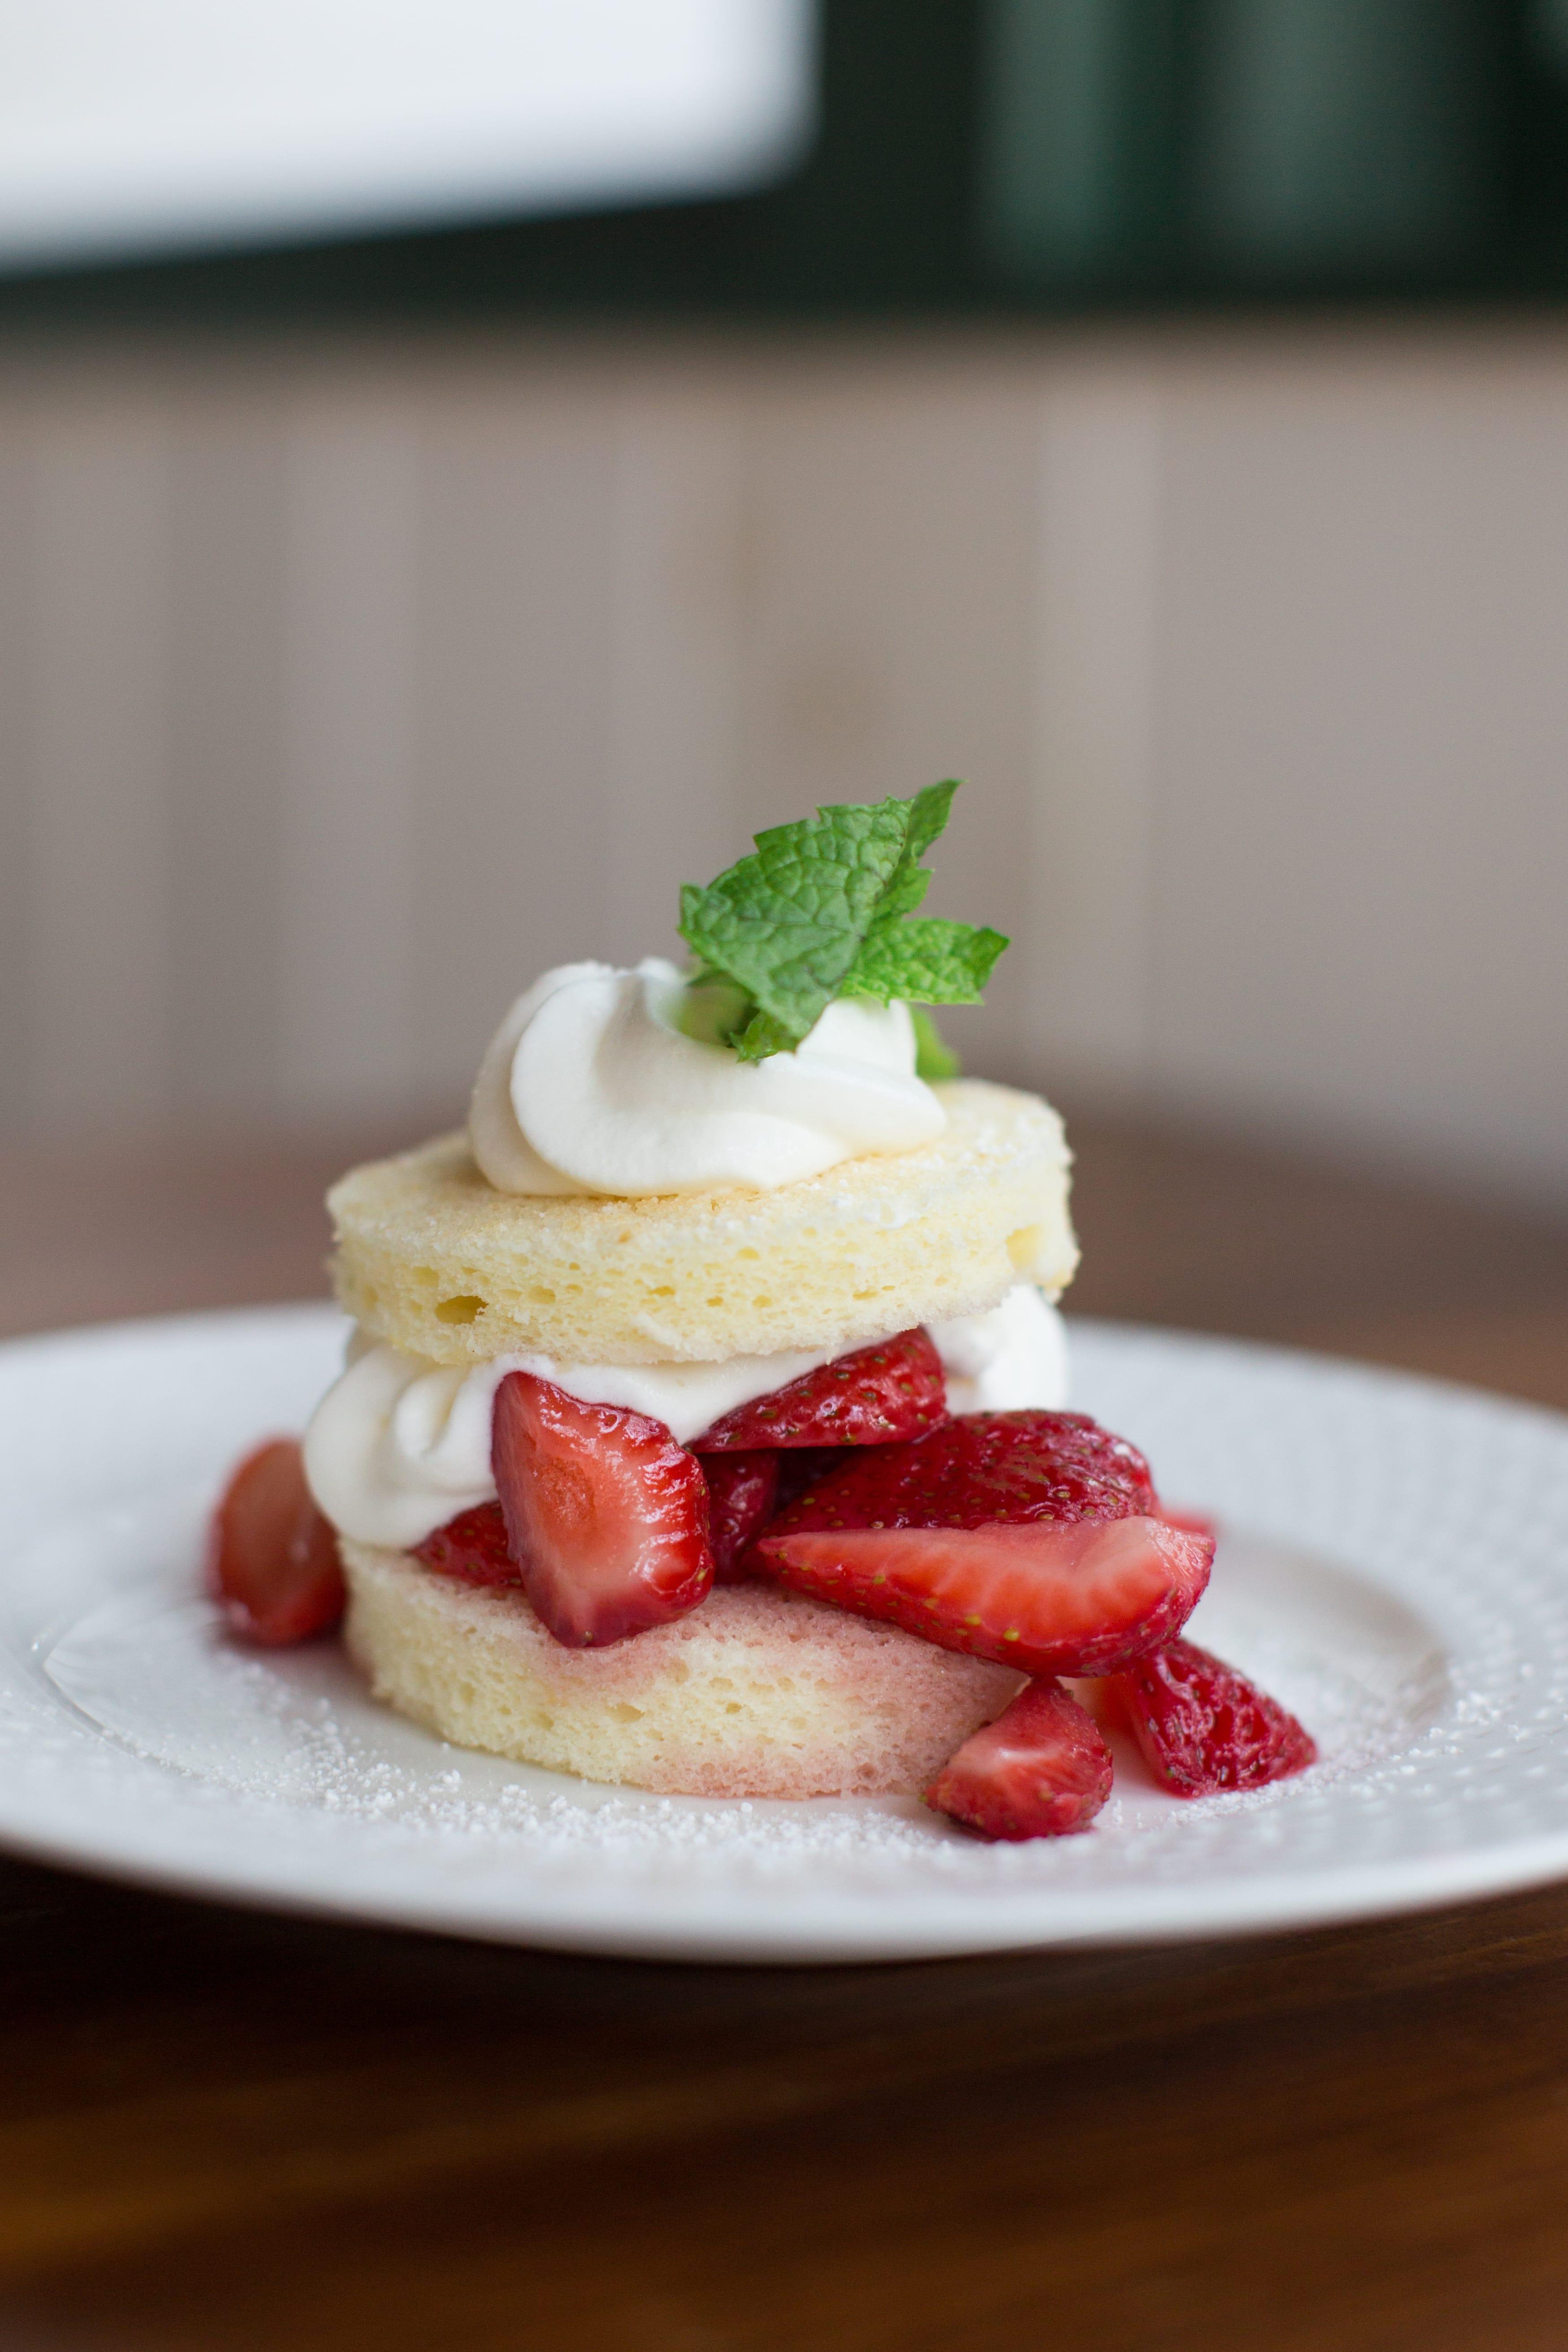 Strawberry shortcake desert